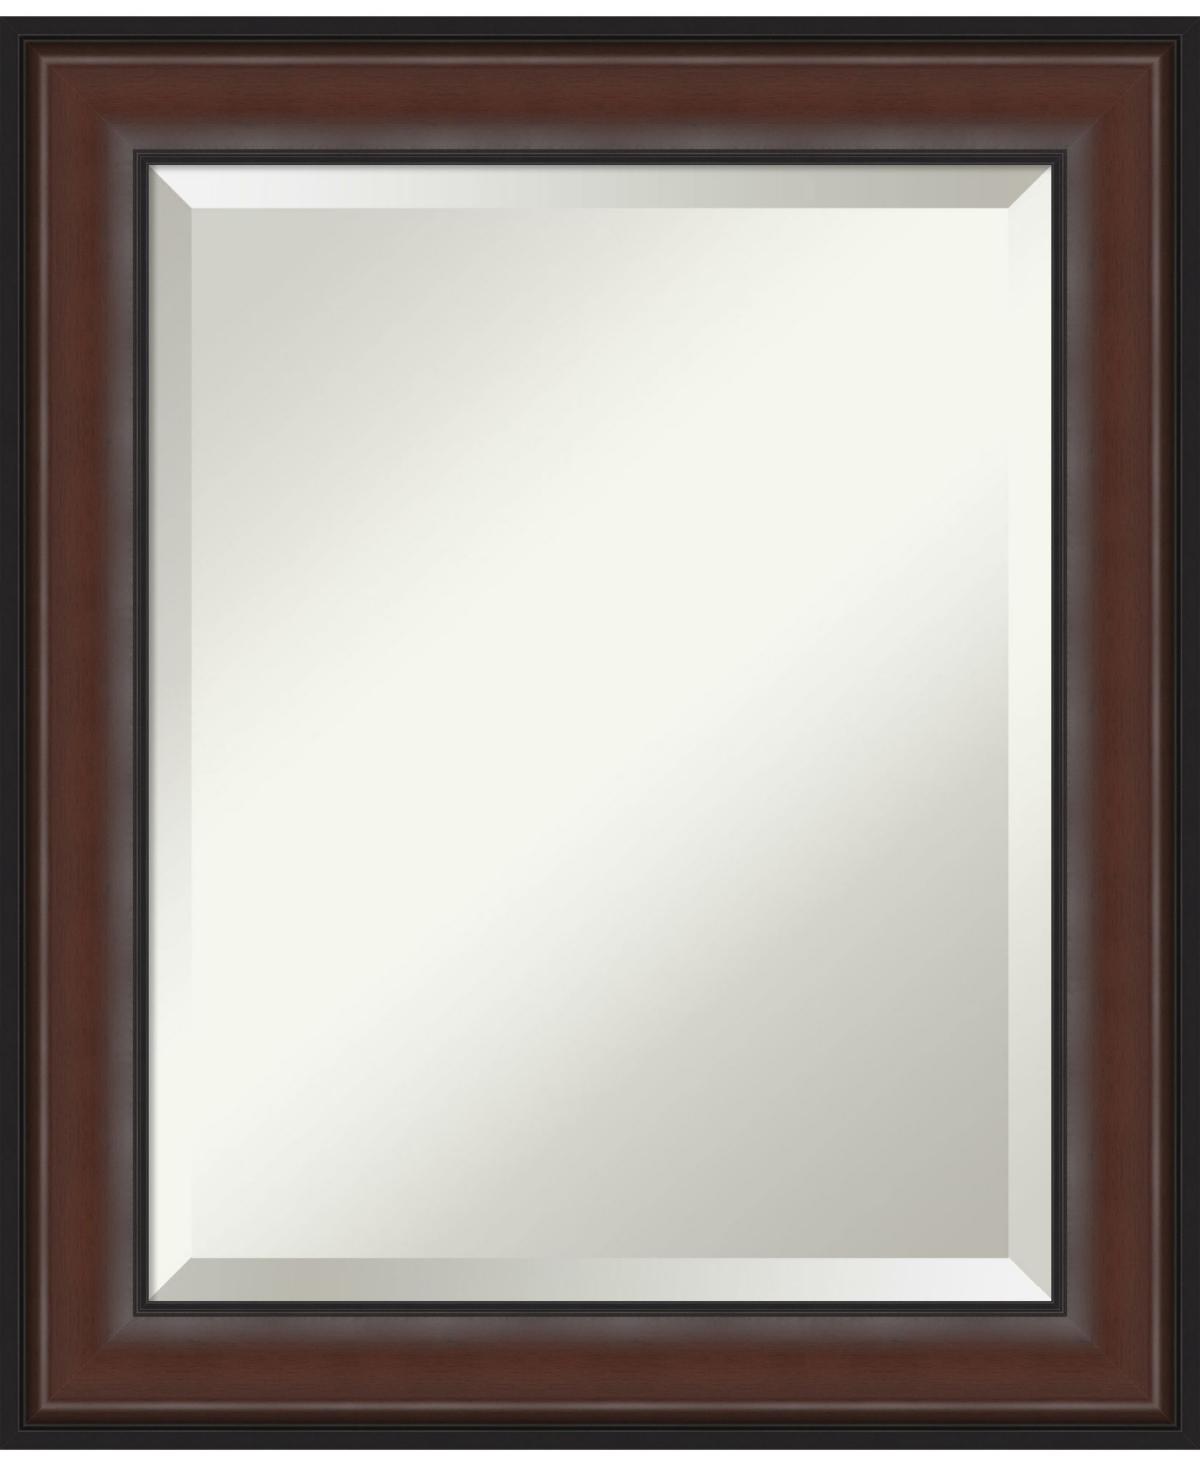 Amanti Art Harvard Framed Bathroom Vanity Wall Mirror, 20.5